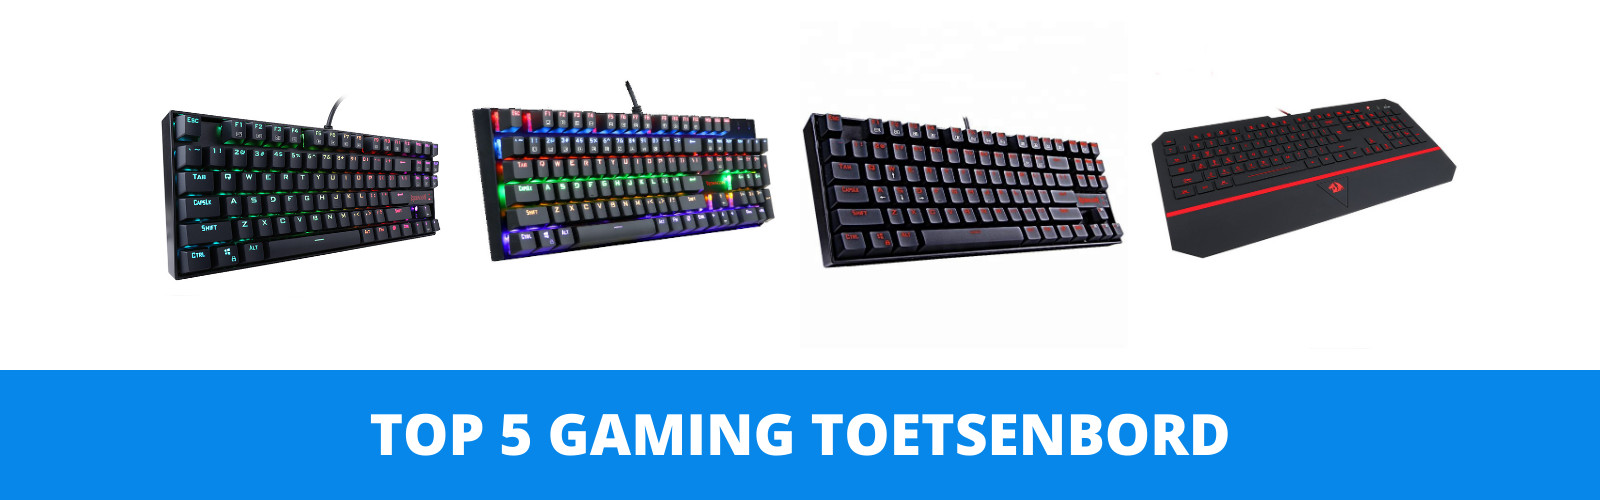 K552-Toetsenbord-gaming-400x400